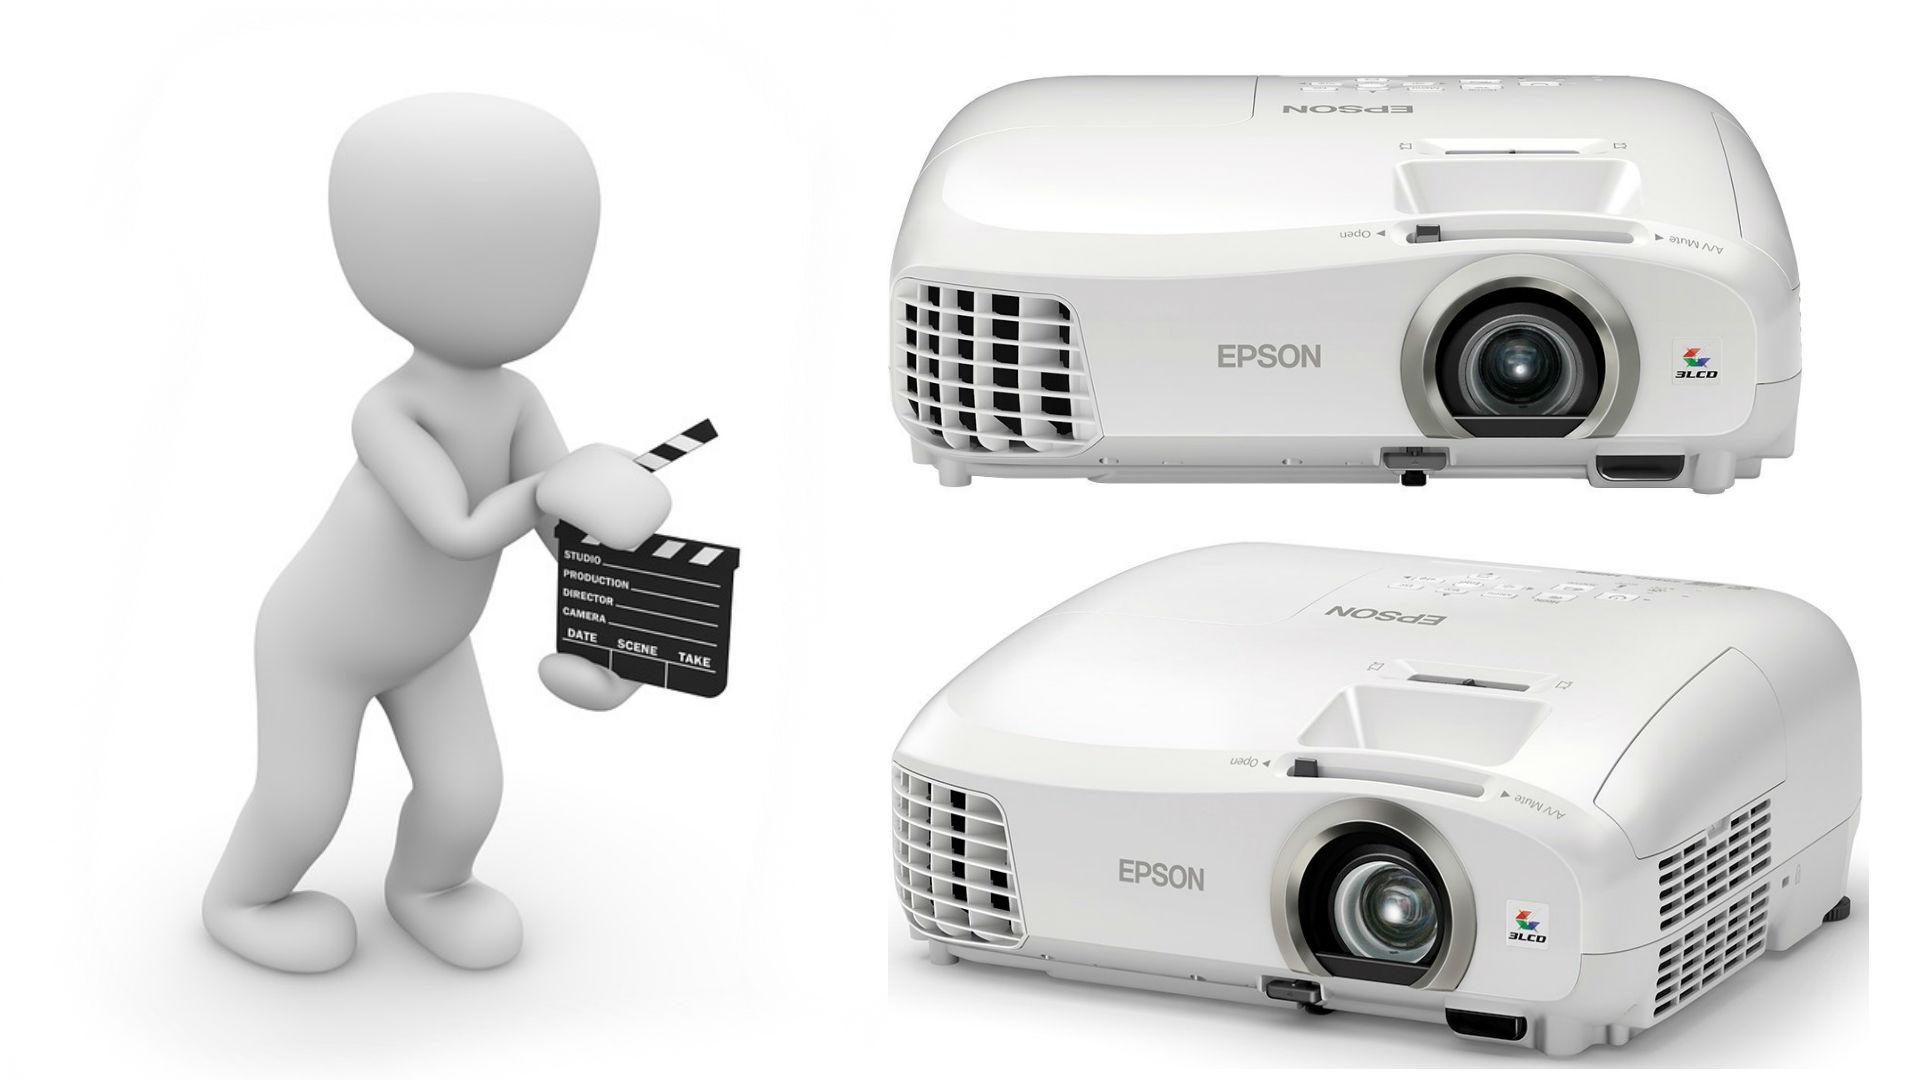 proyector_home_cinema_epson_eh-tw5300.jpg